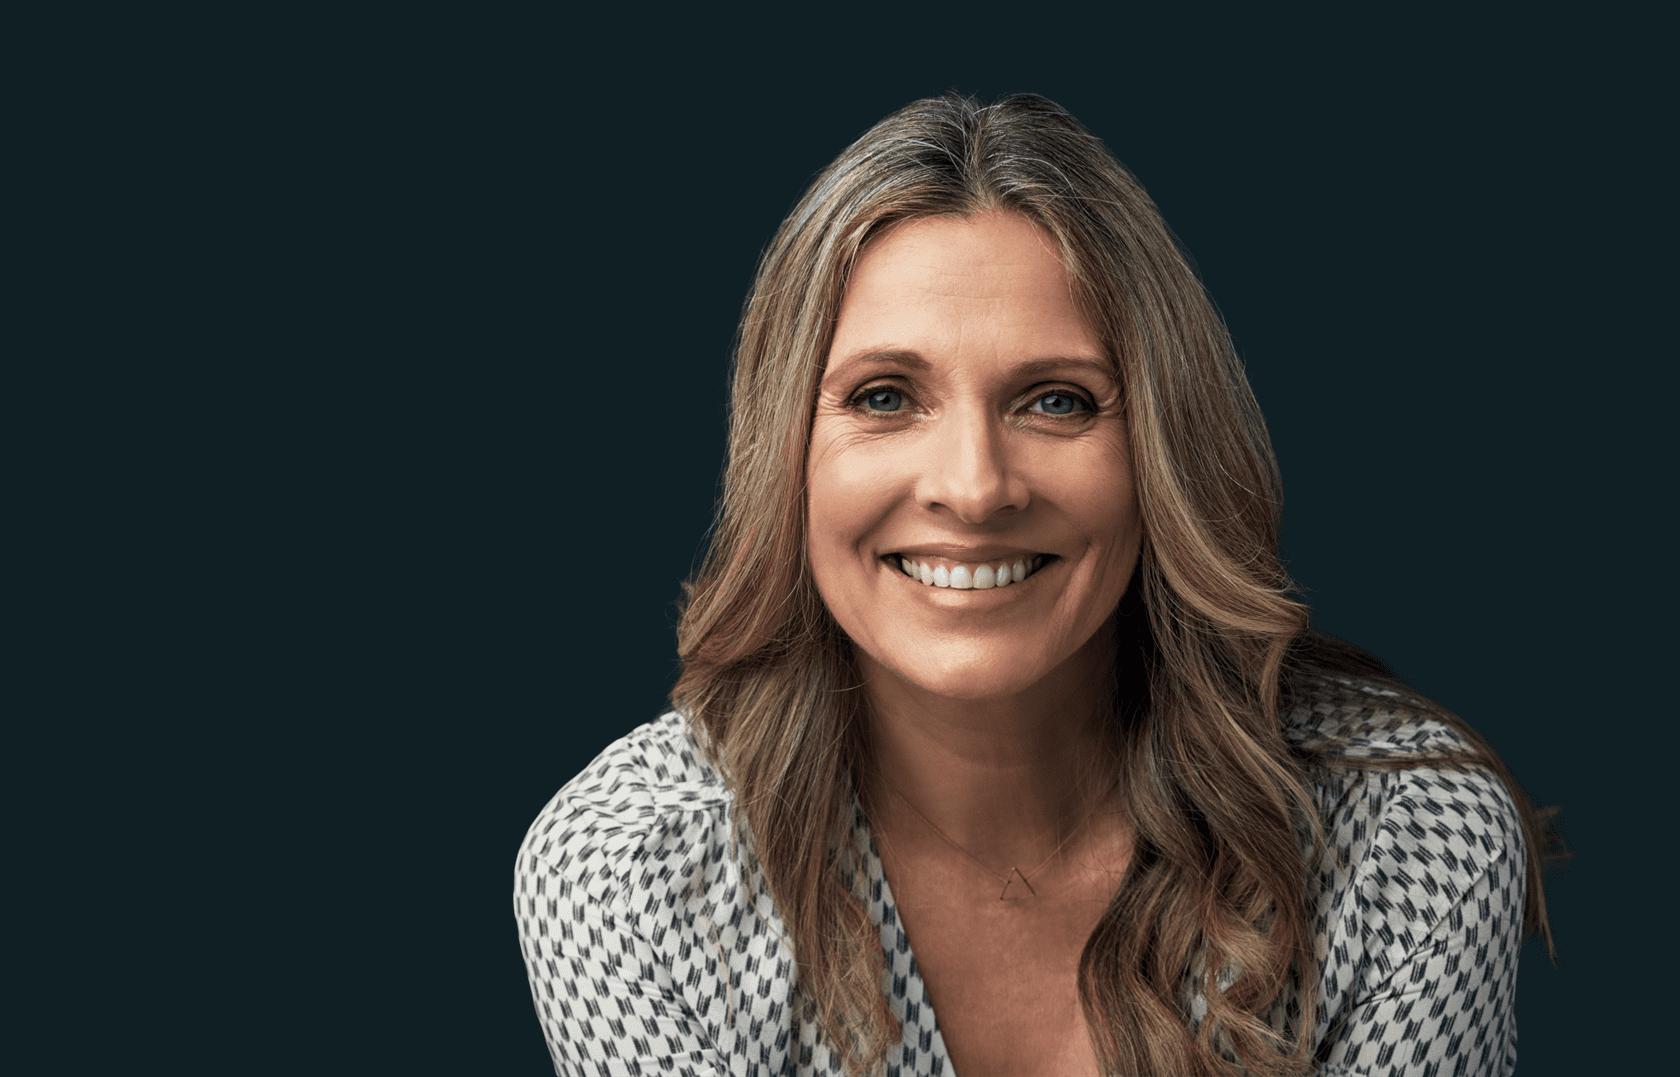 FGP woman smiling